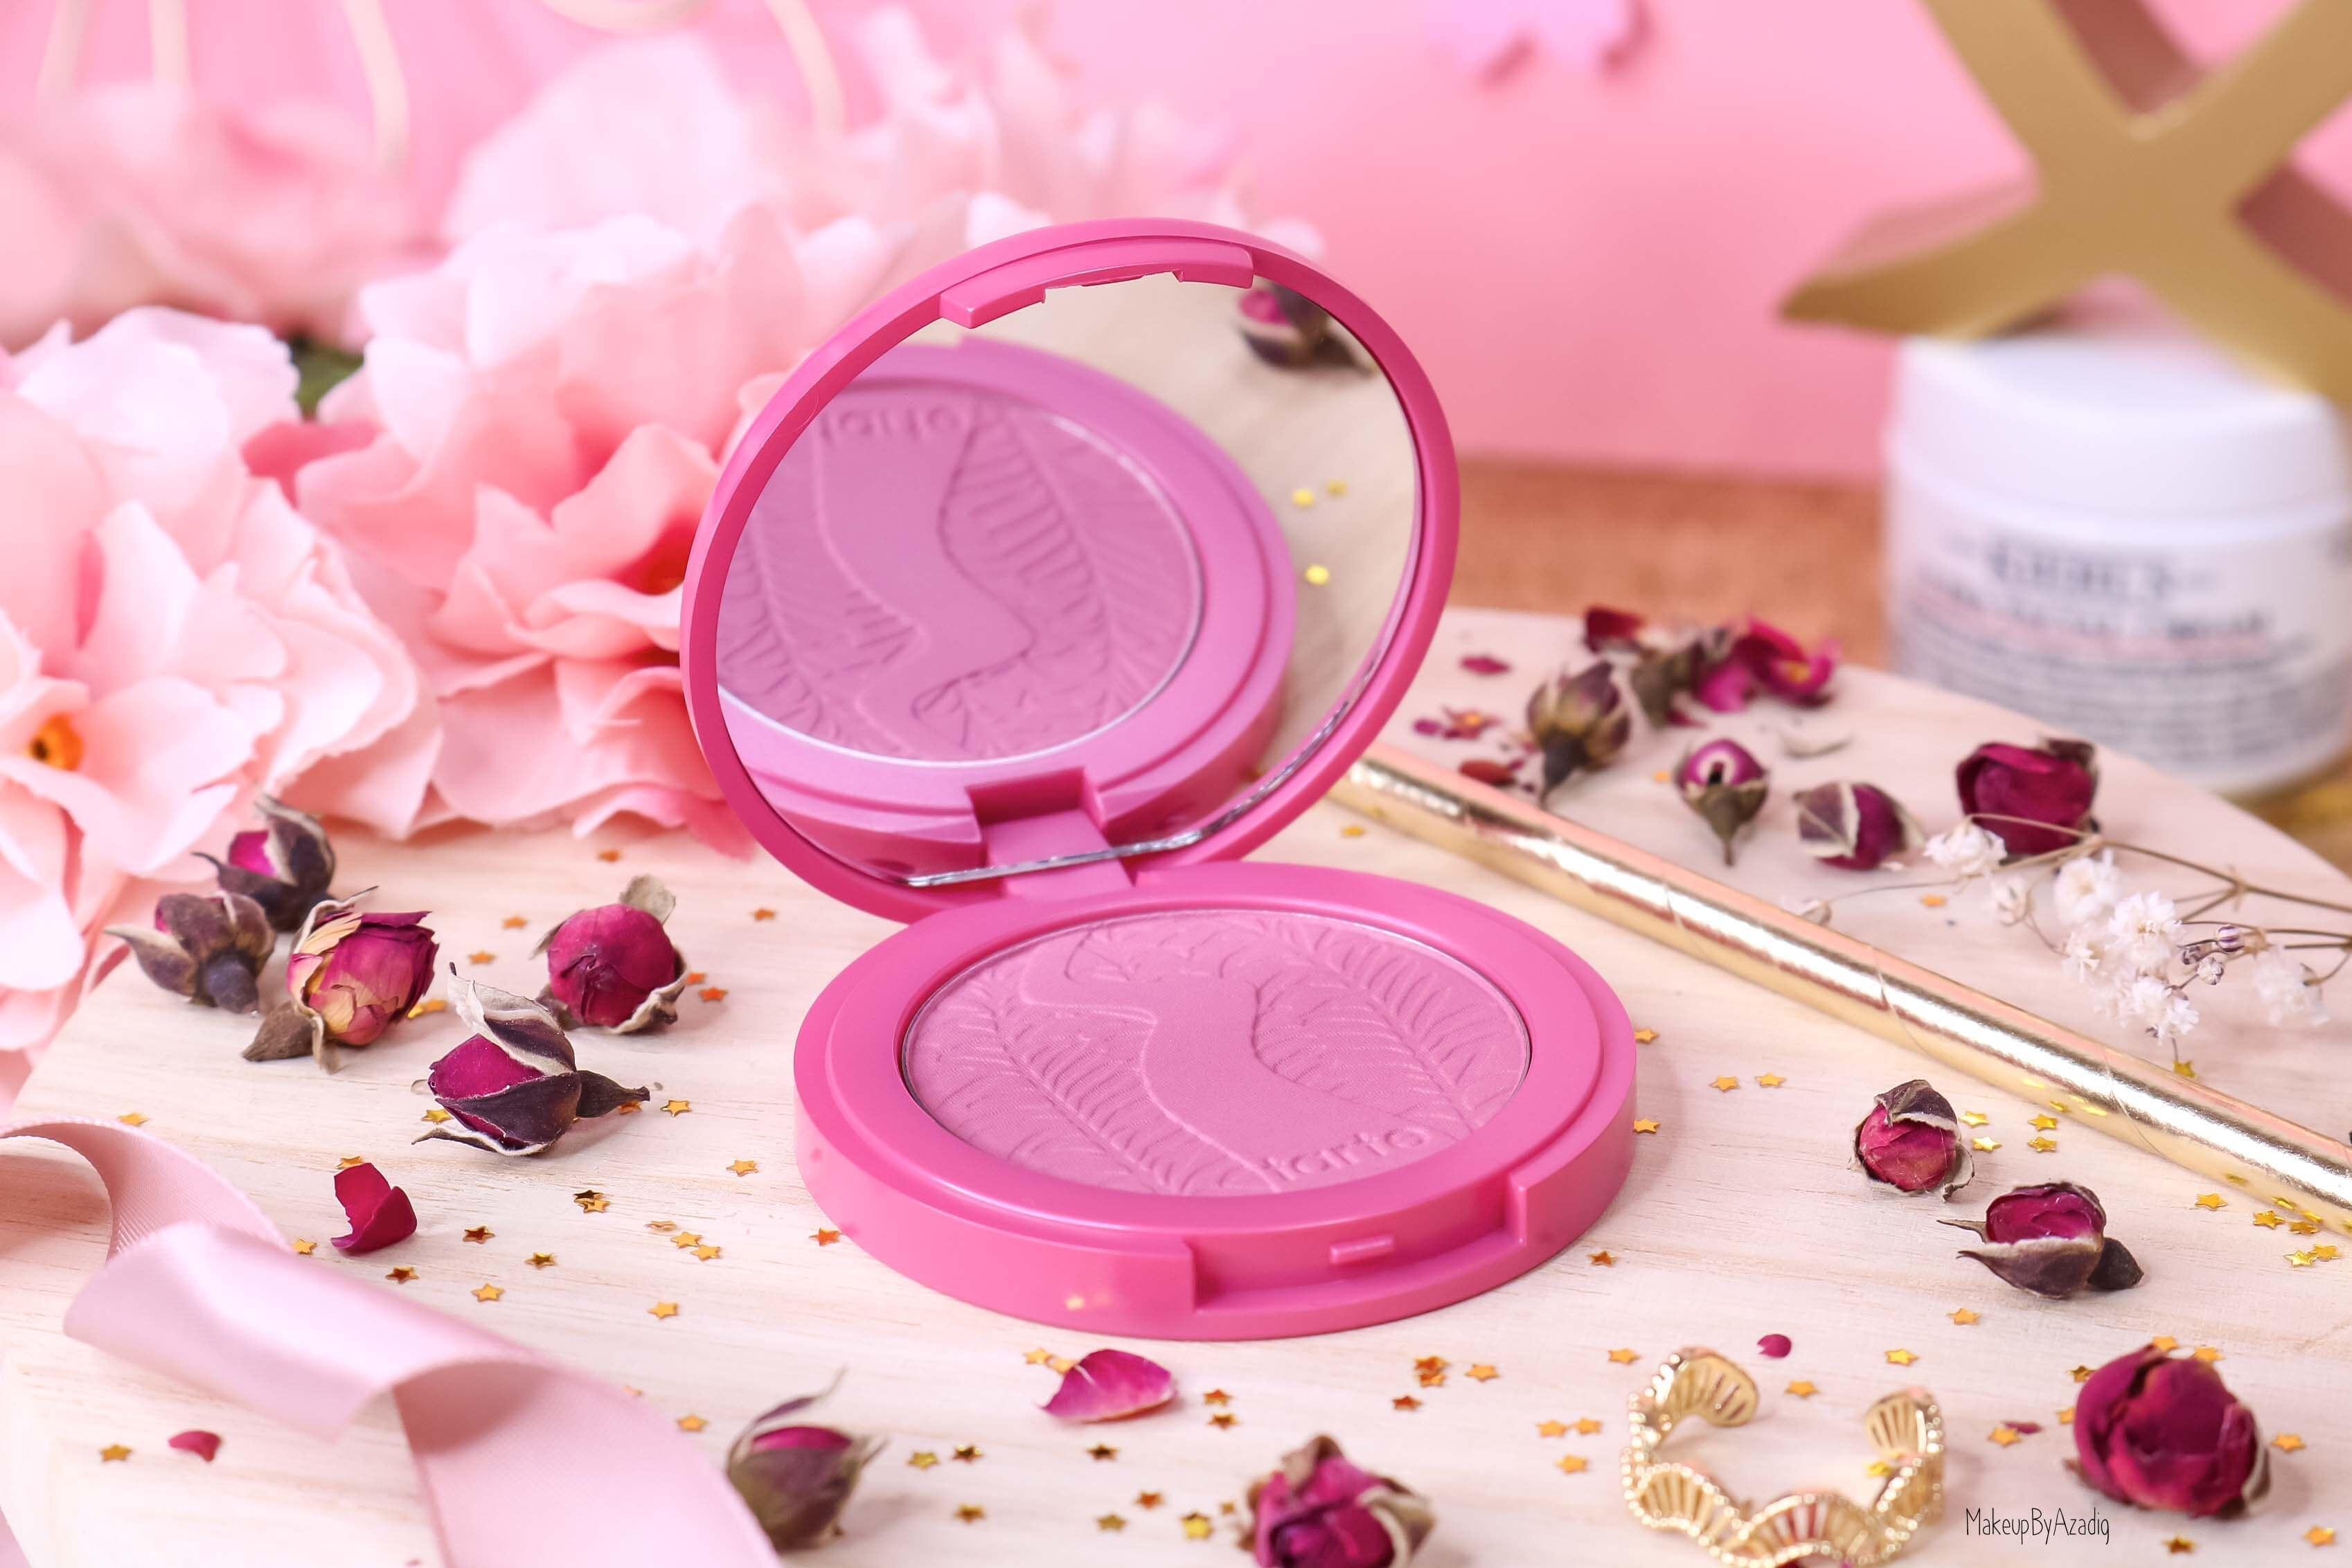 revue-blush-amazonian-clay-tarte-cosmetics-makeupbyazadig-sephora-france-blushing-bride-swatch-avis-prix-miniature